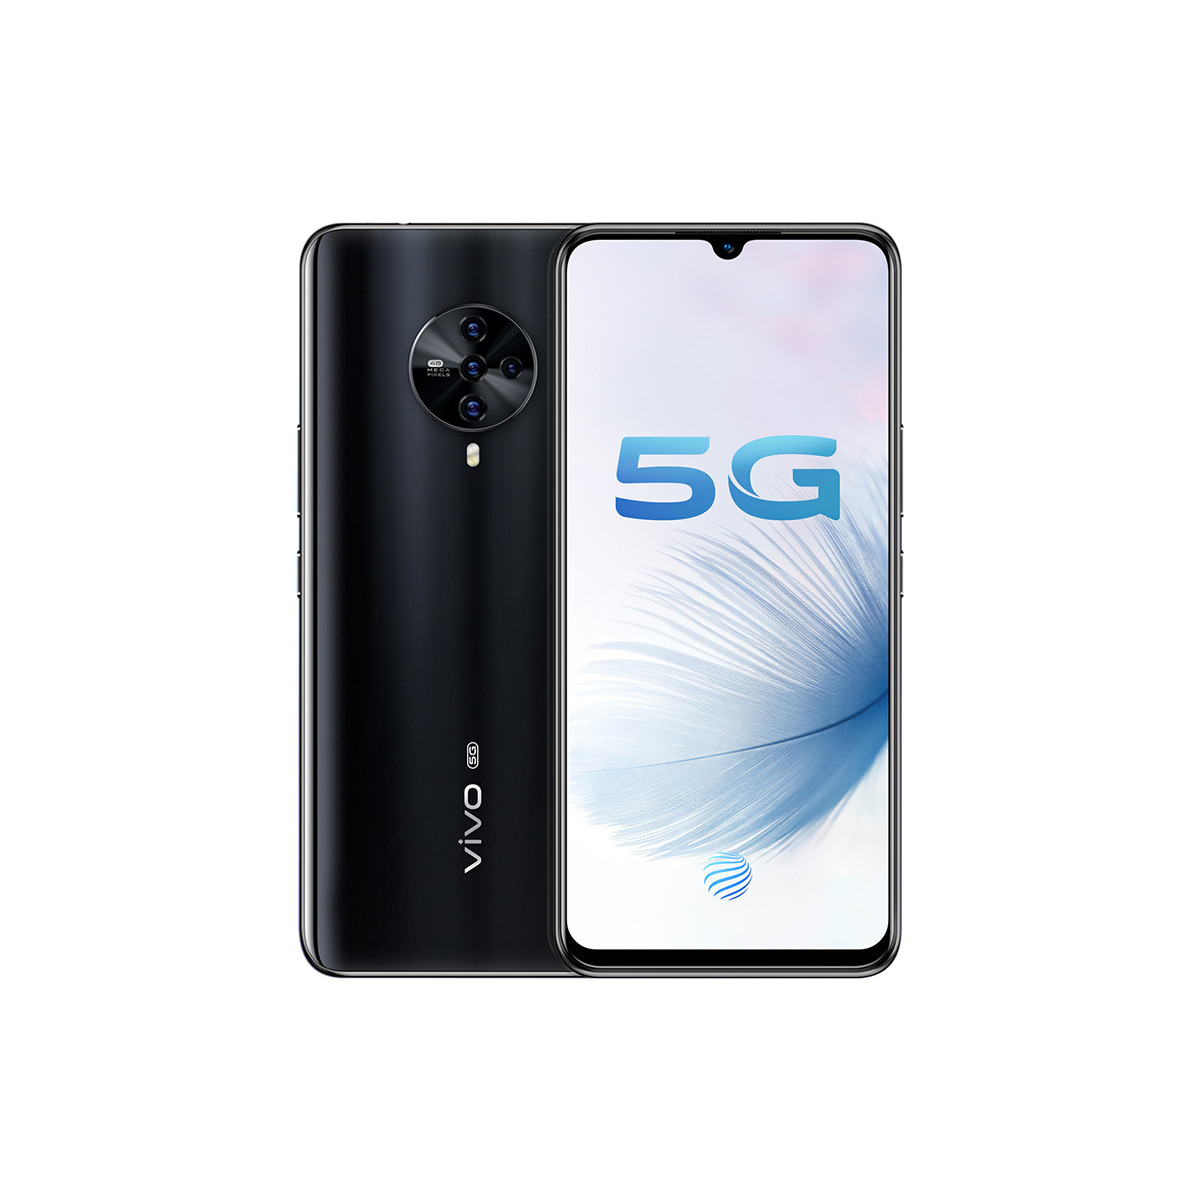 vivovivo【手环耳机套餐】S6双模5G 4800W超级四摄拍照手机S6-8G-128G-爵士黑